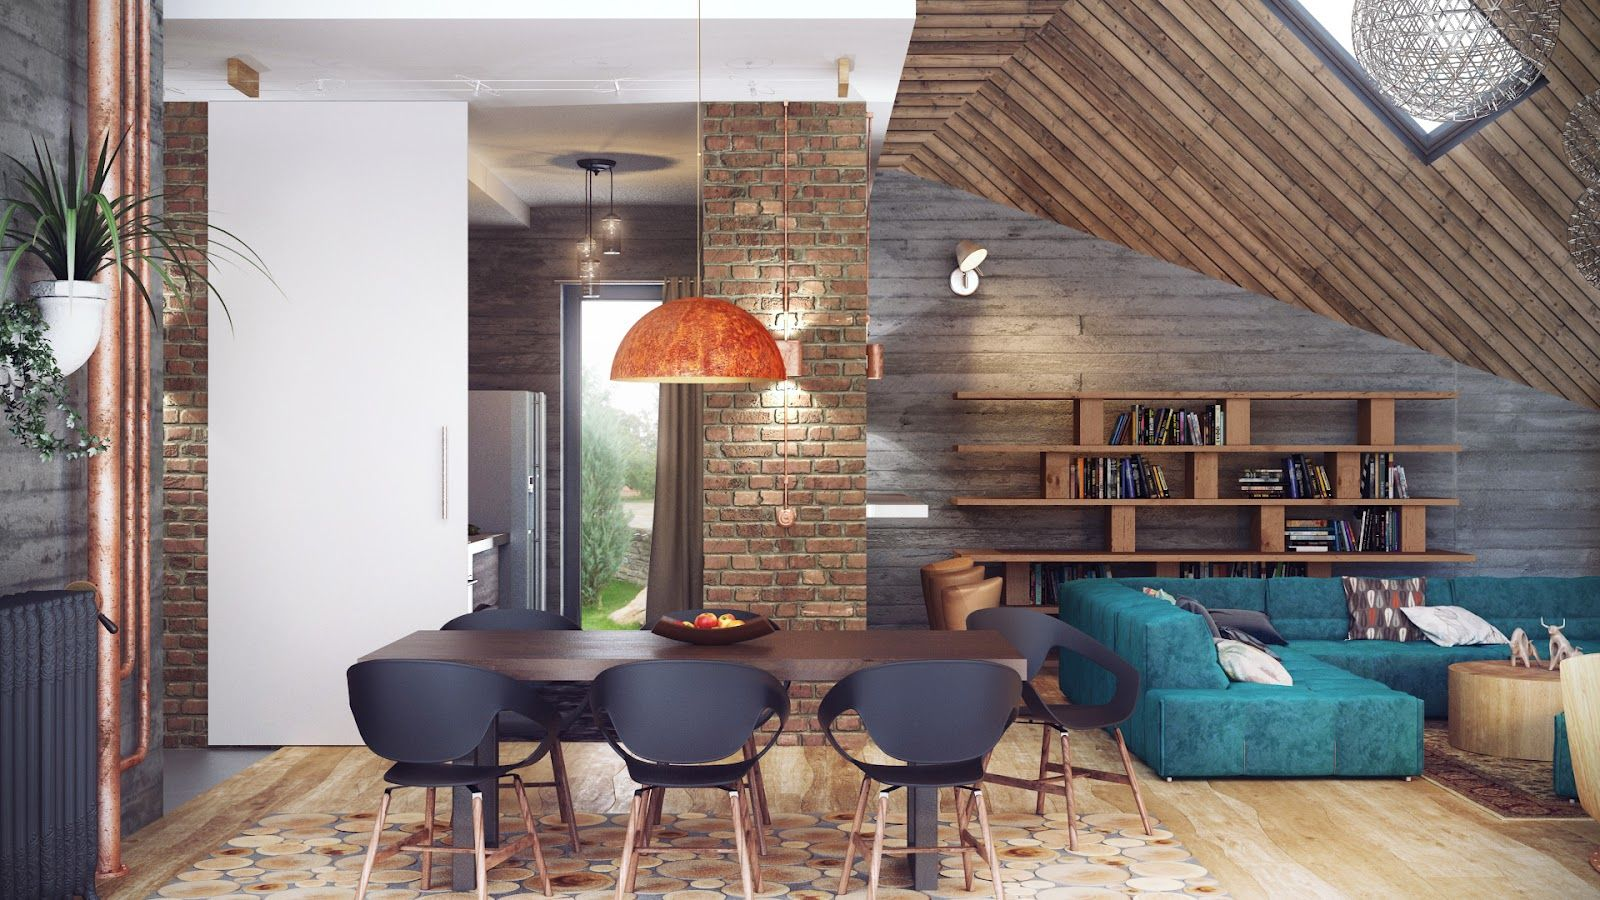 Loft like interior design by uglyanitsa alexander 3